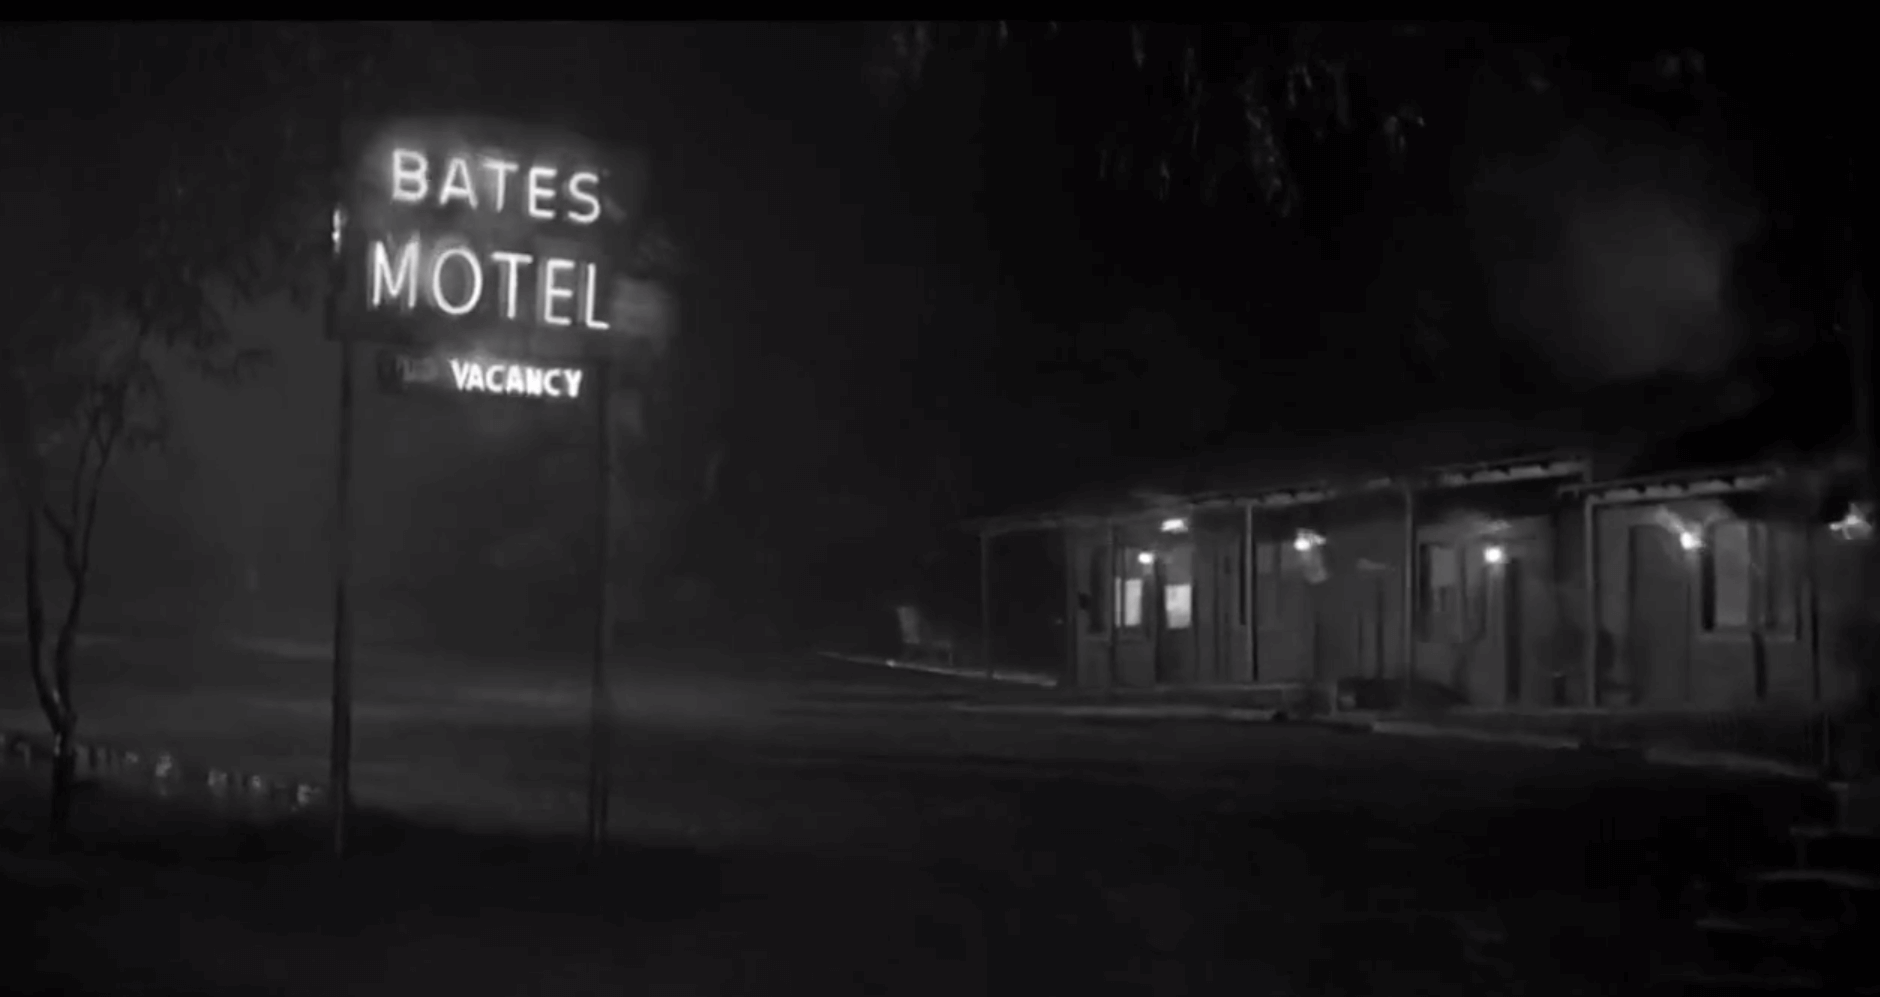 Bates Motel Neon Sign